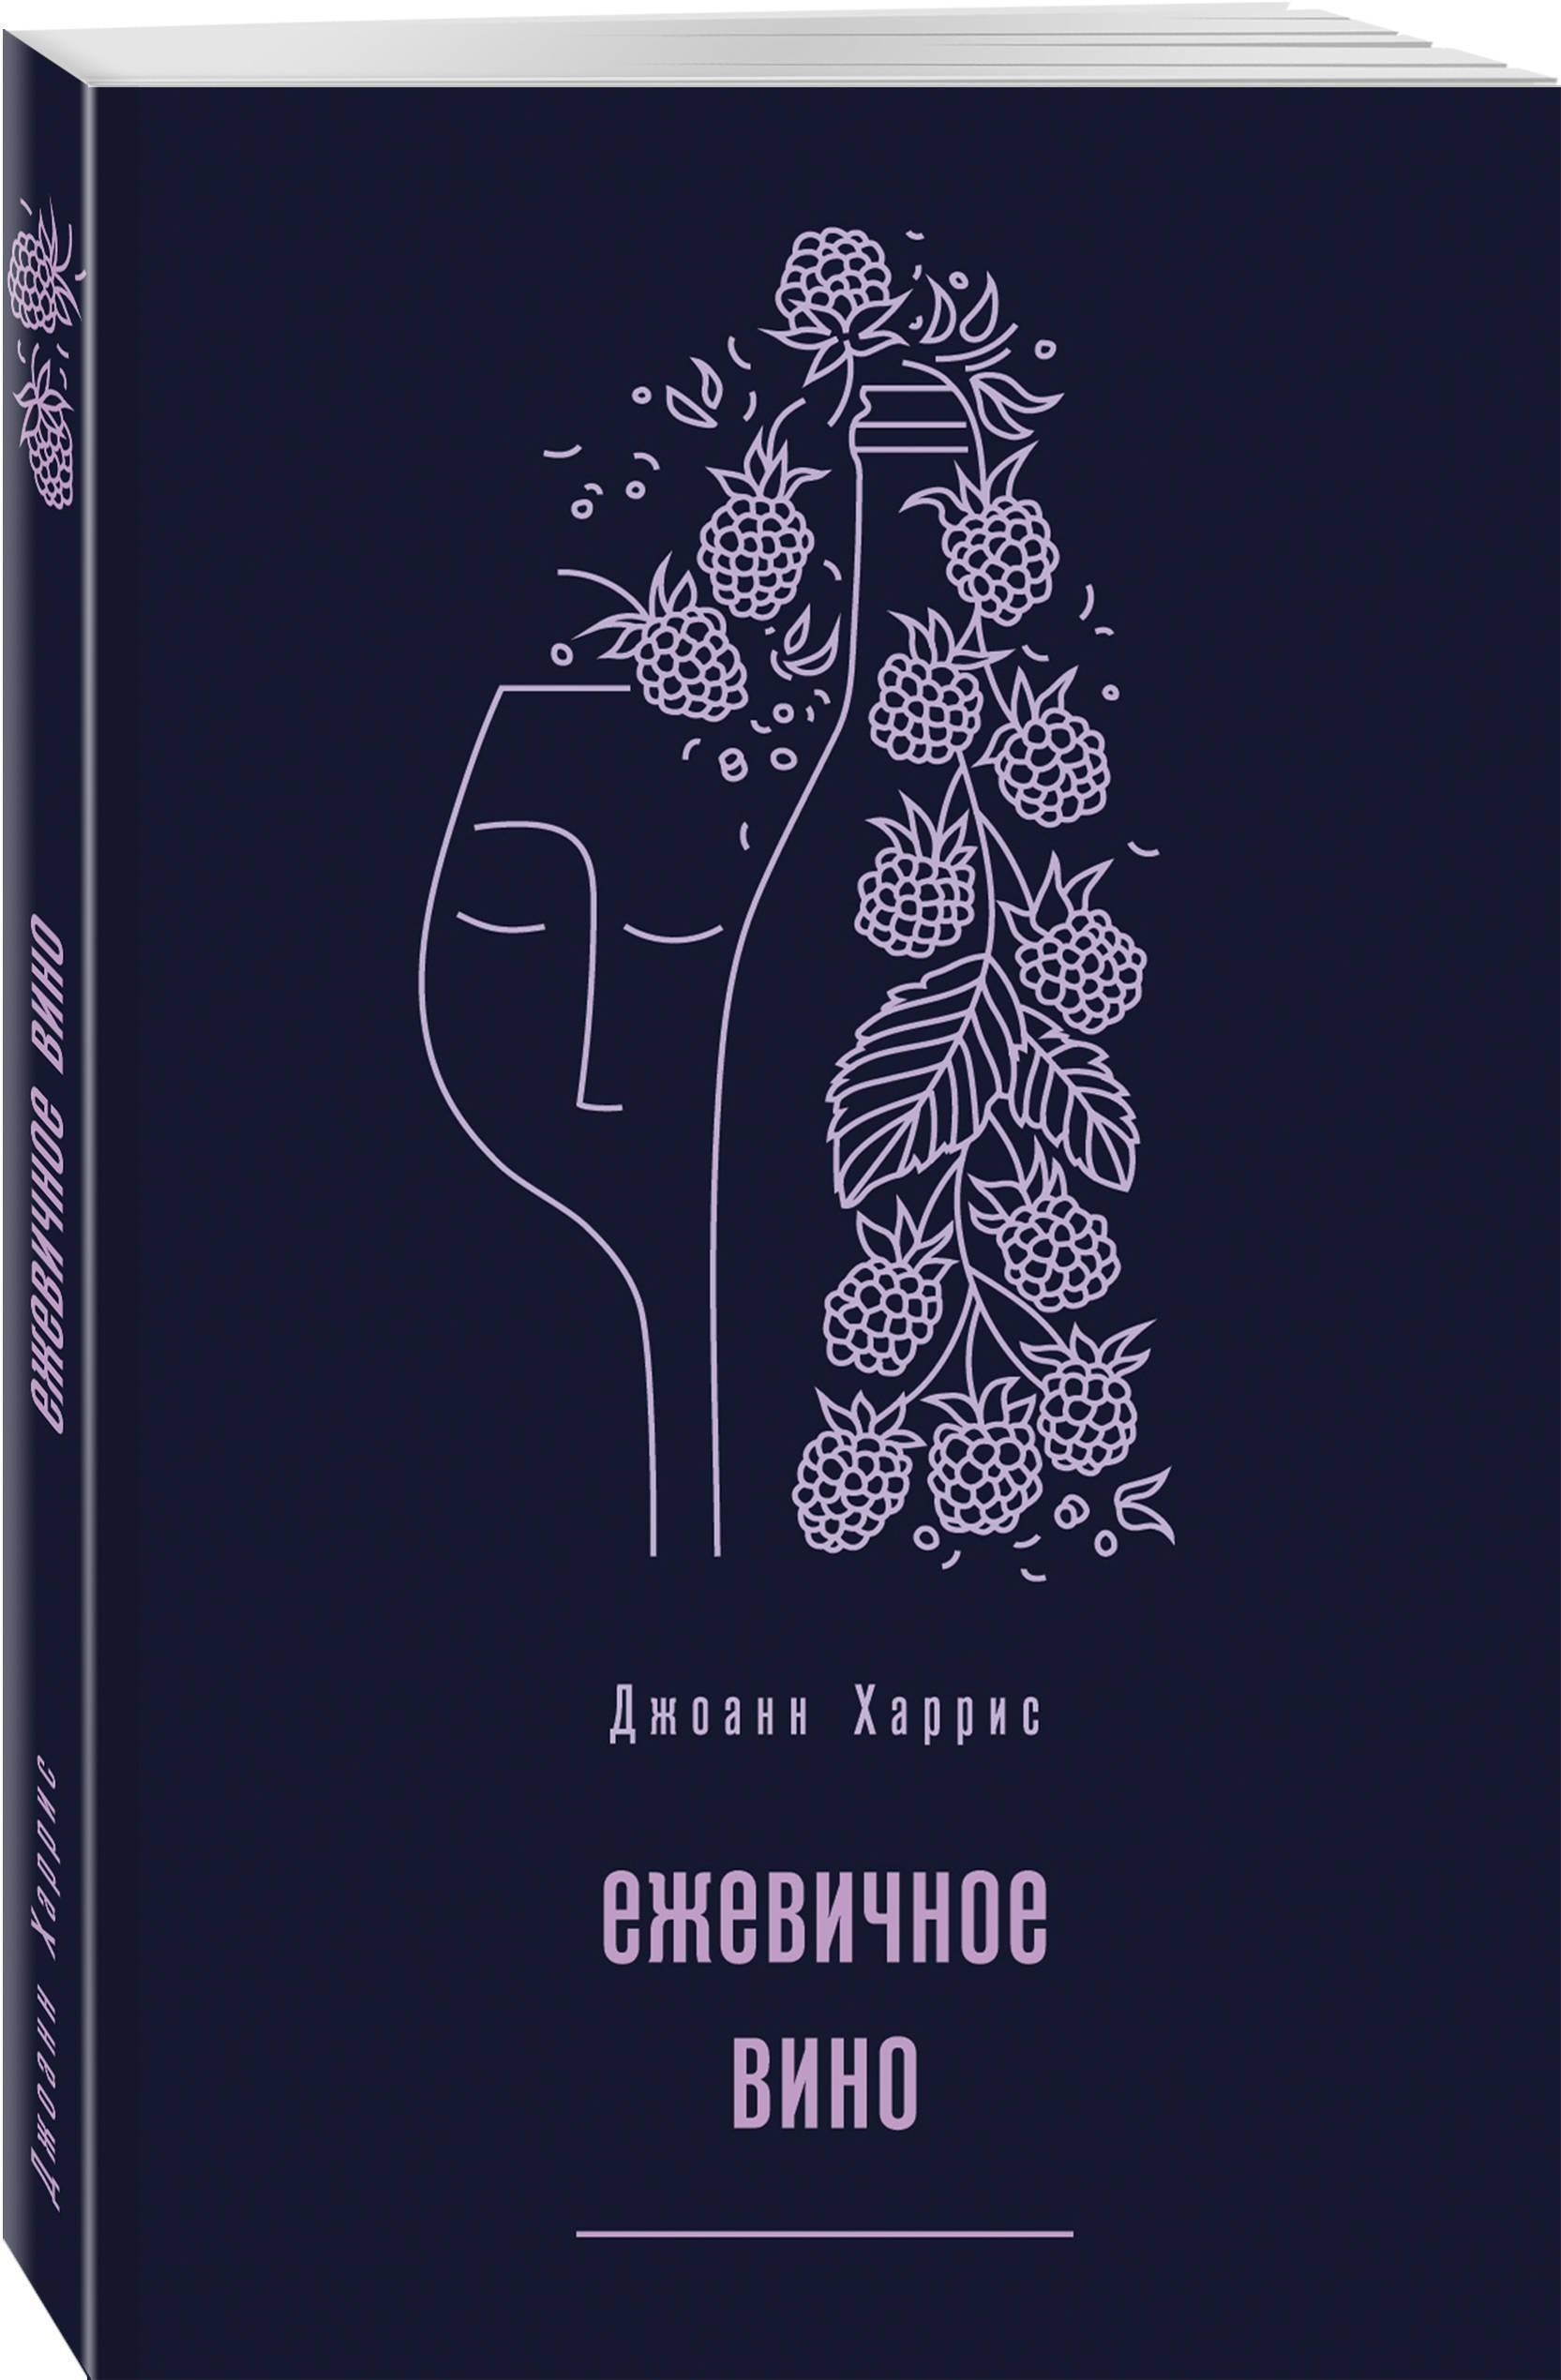 Творчество джоанн харрис. книга джоанн харрис «ежевичное вино» :: syl.ru